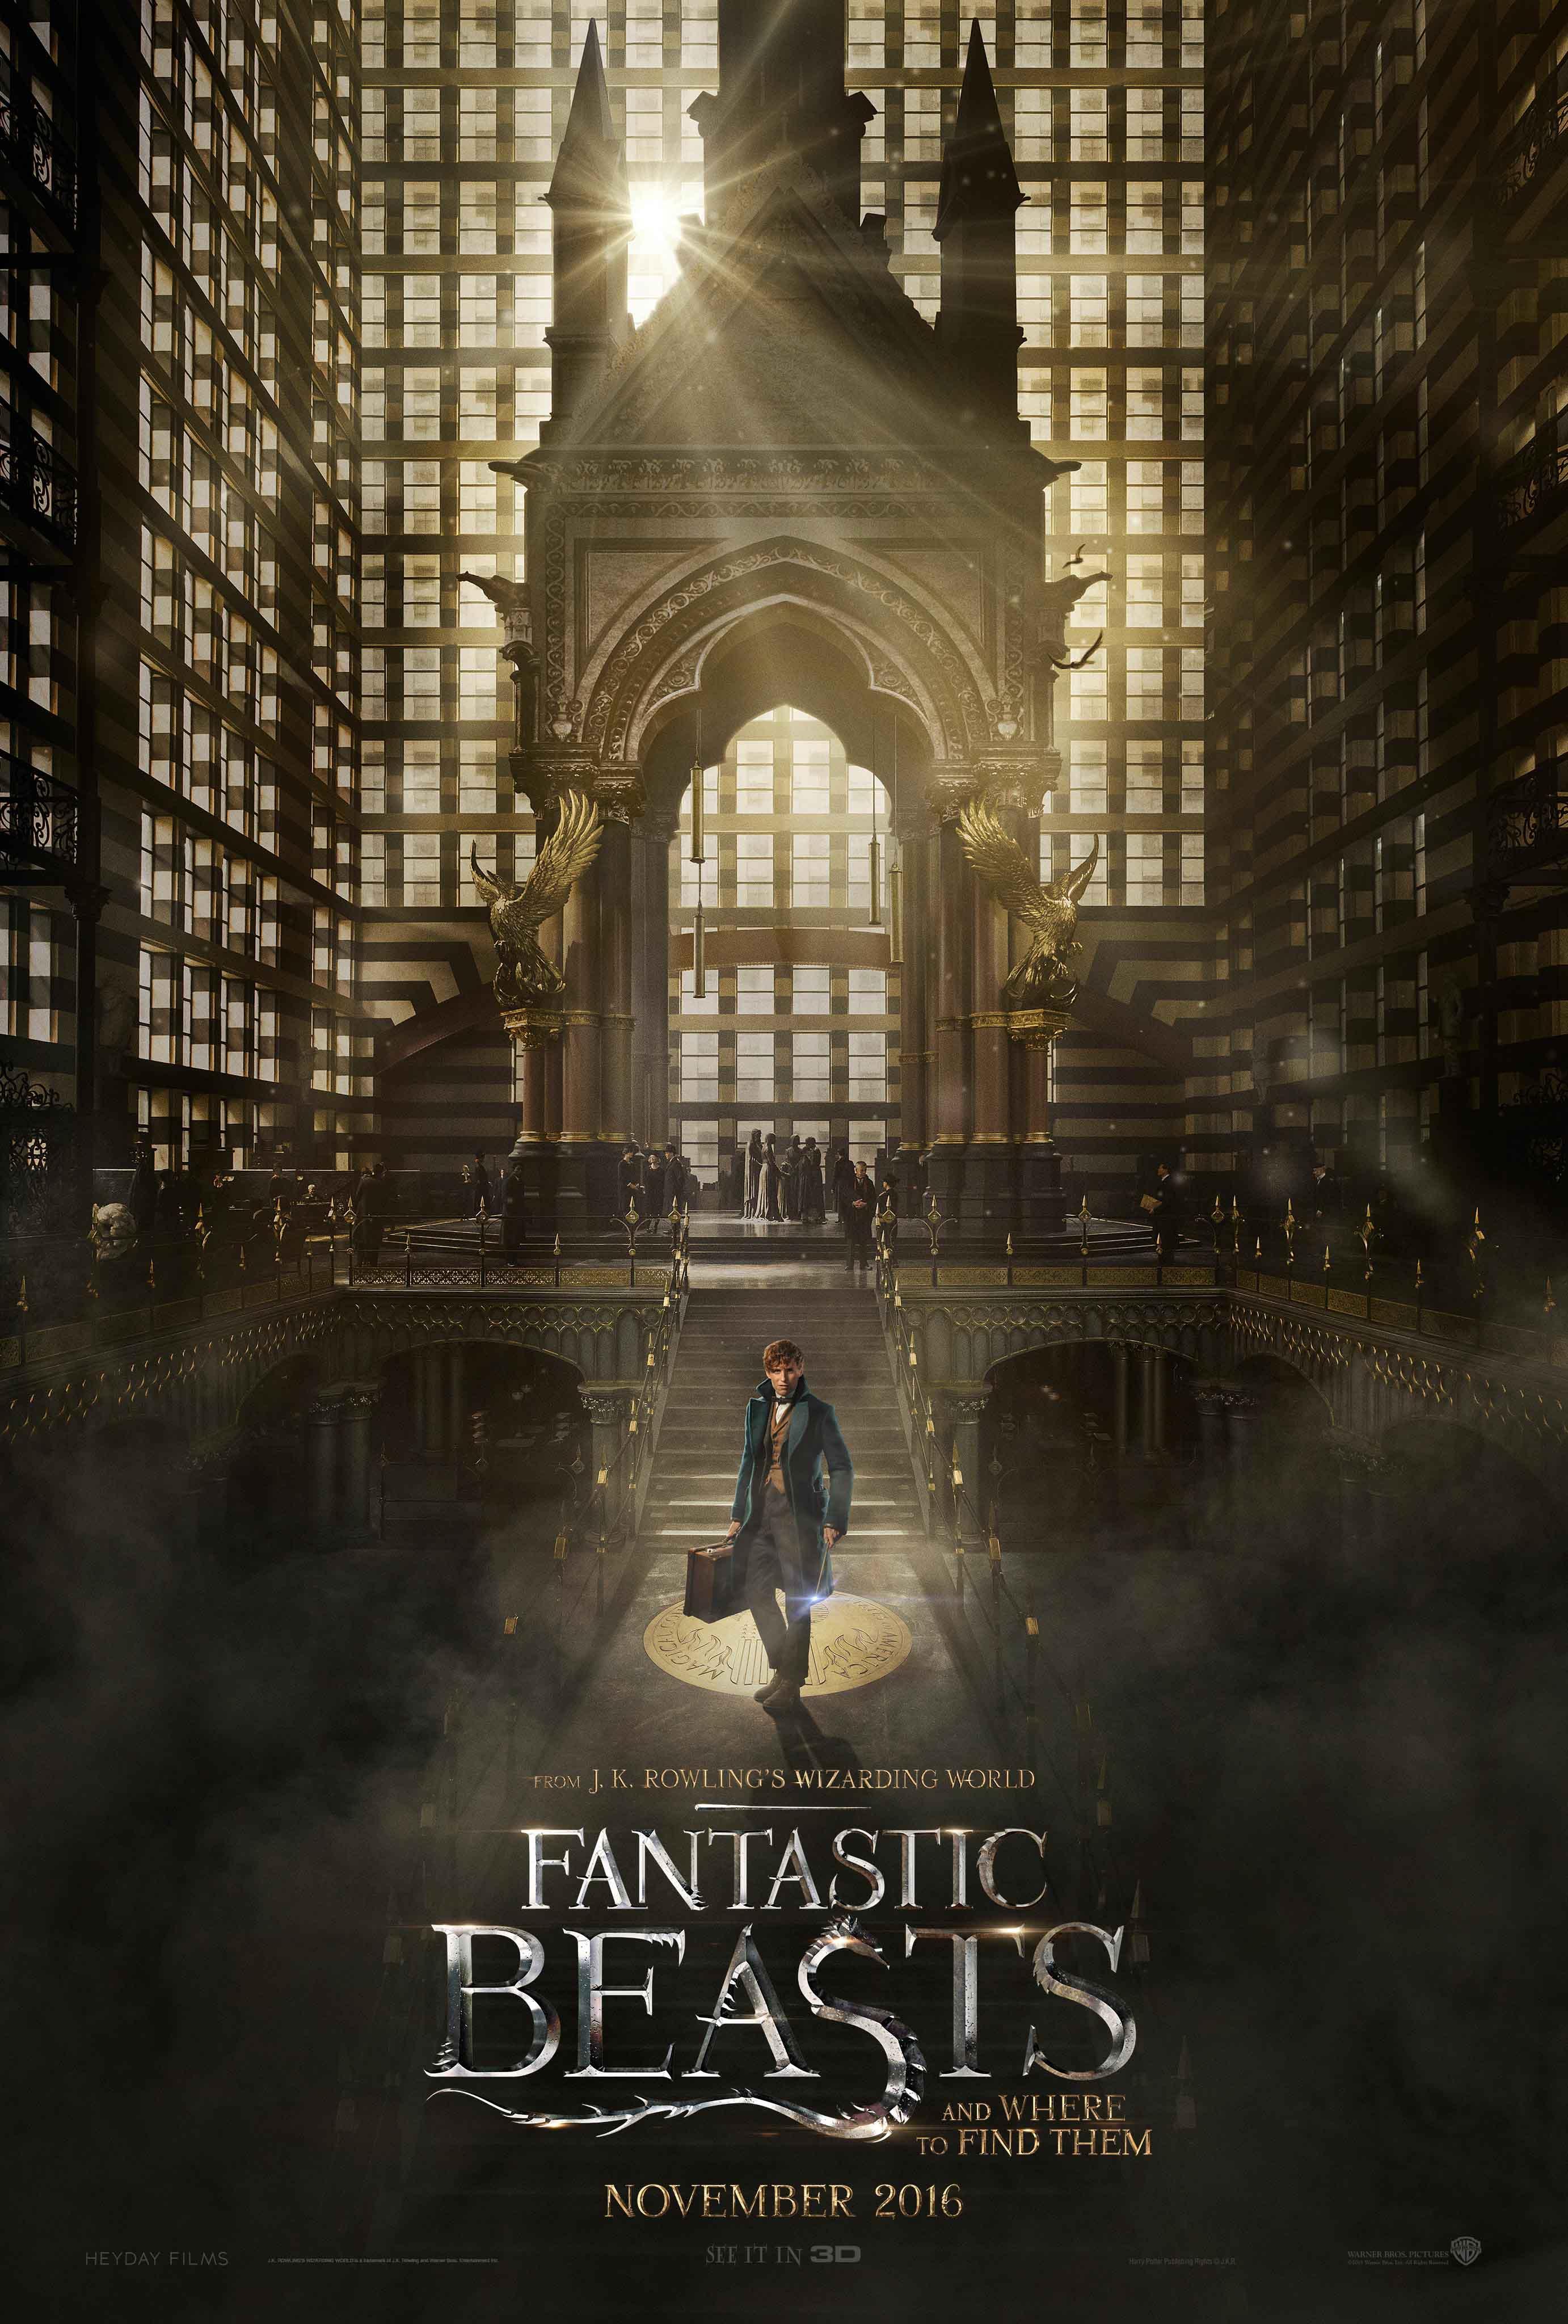 Fantastic Beasts Wallpapers Top Free Fantastic Beasts